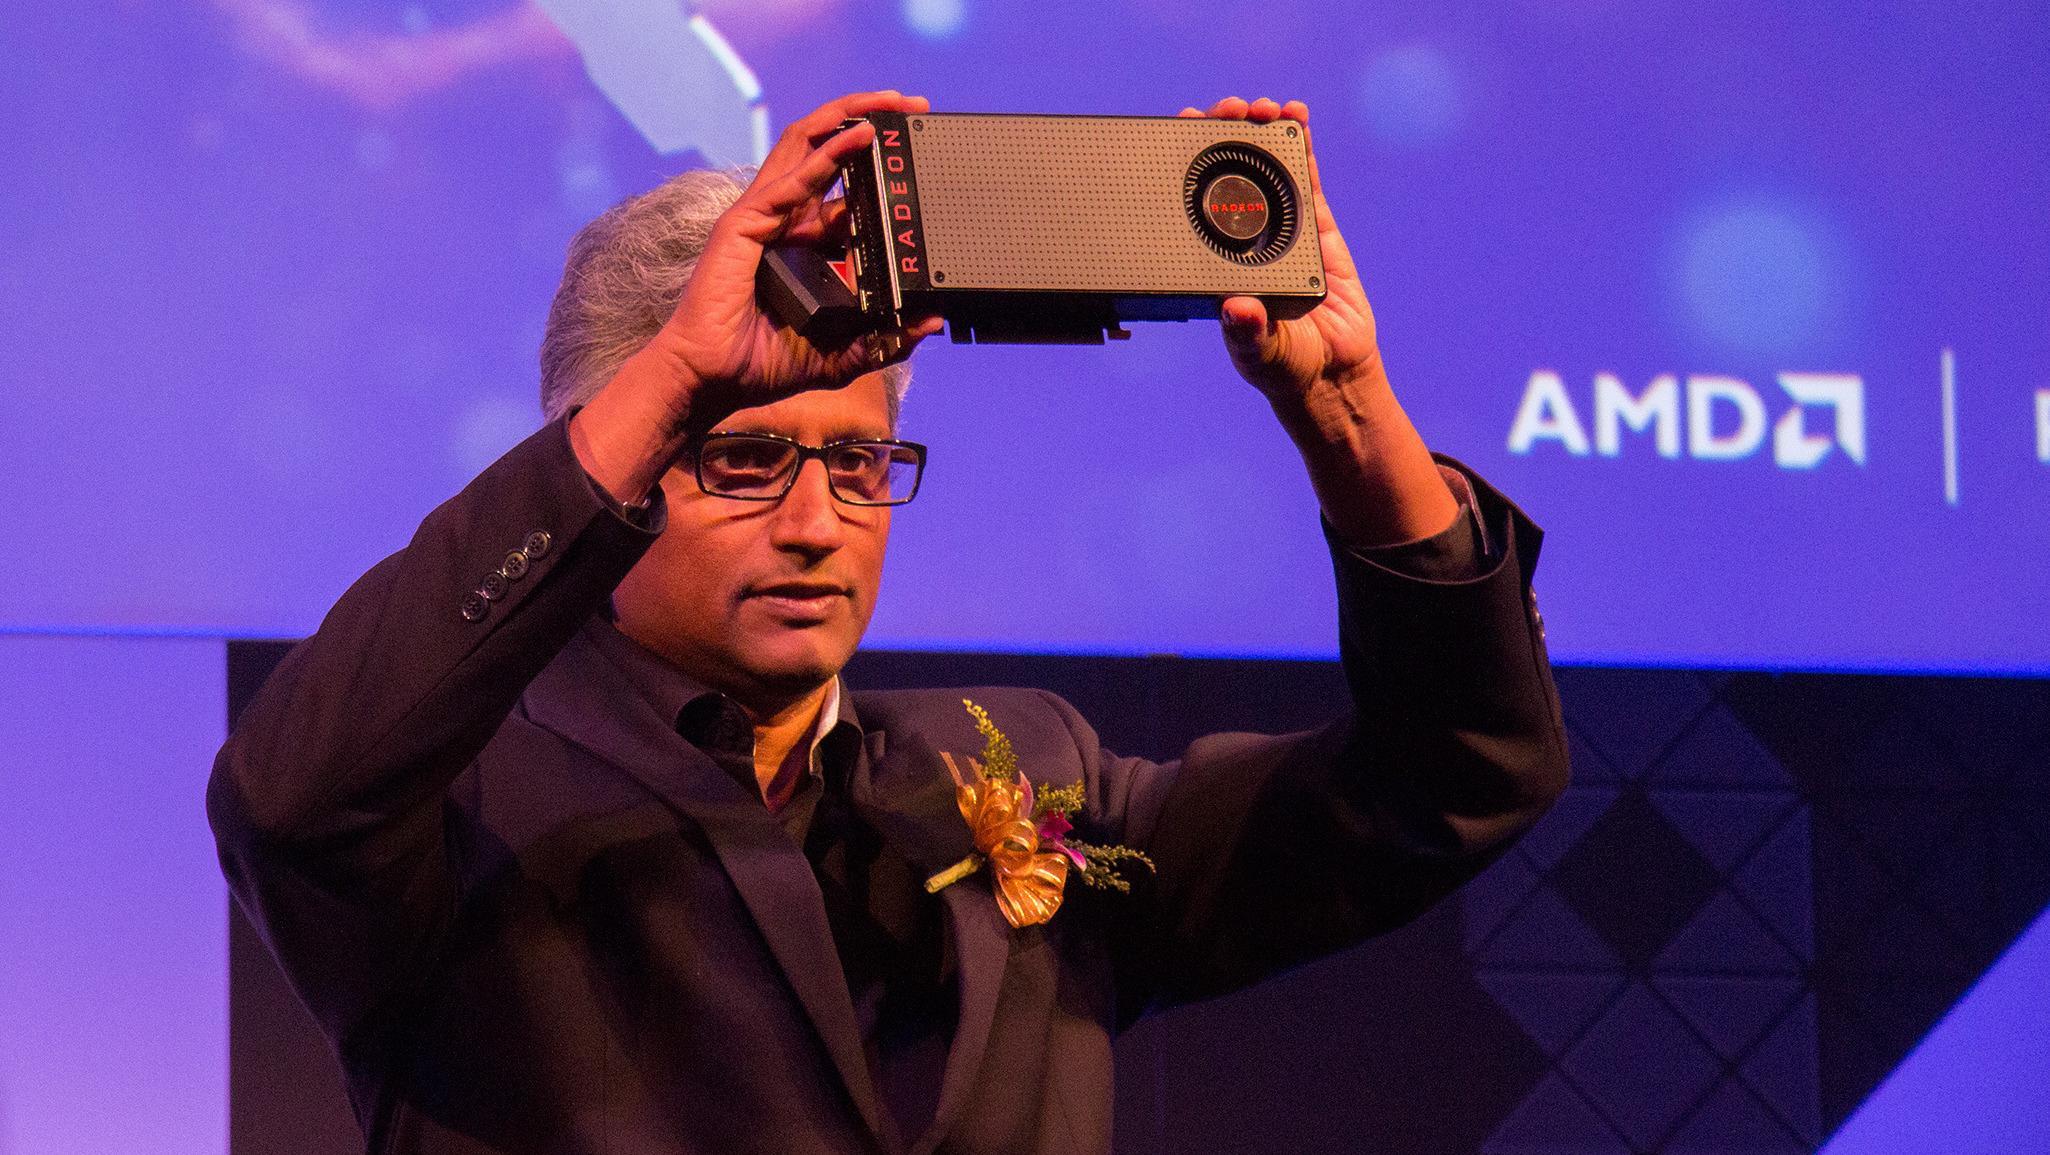 AMD Radeon-sjef Raja Koduri løfter opp det første Polaris-baserte grafikkortet, RX 480, under avdukningen på Computex 2016.